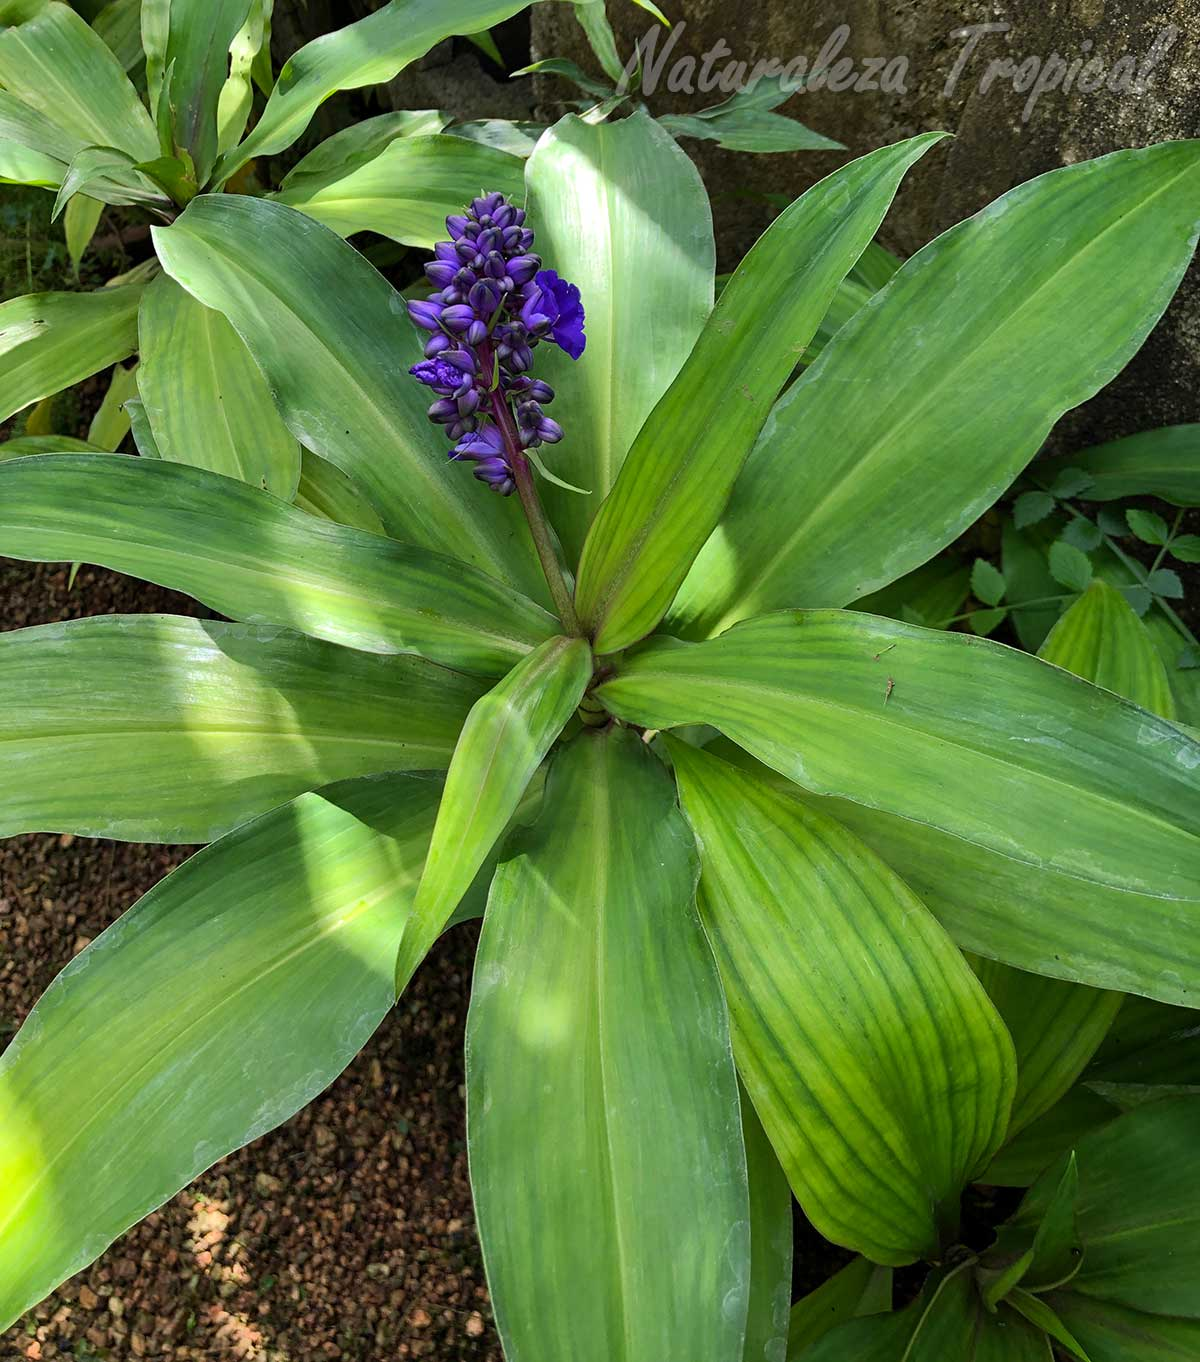 Follaje e inflorescencia de la planta conocida como Jengibre Azul, Dichorisandra thyrsiflora